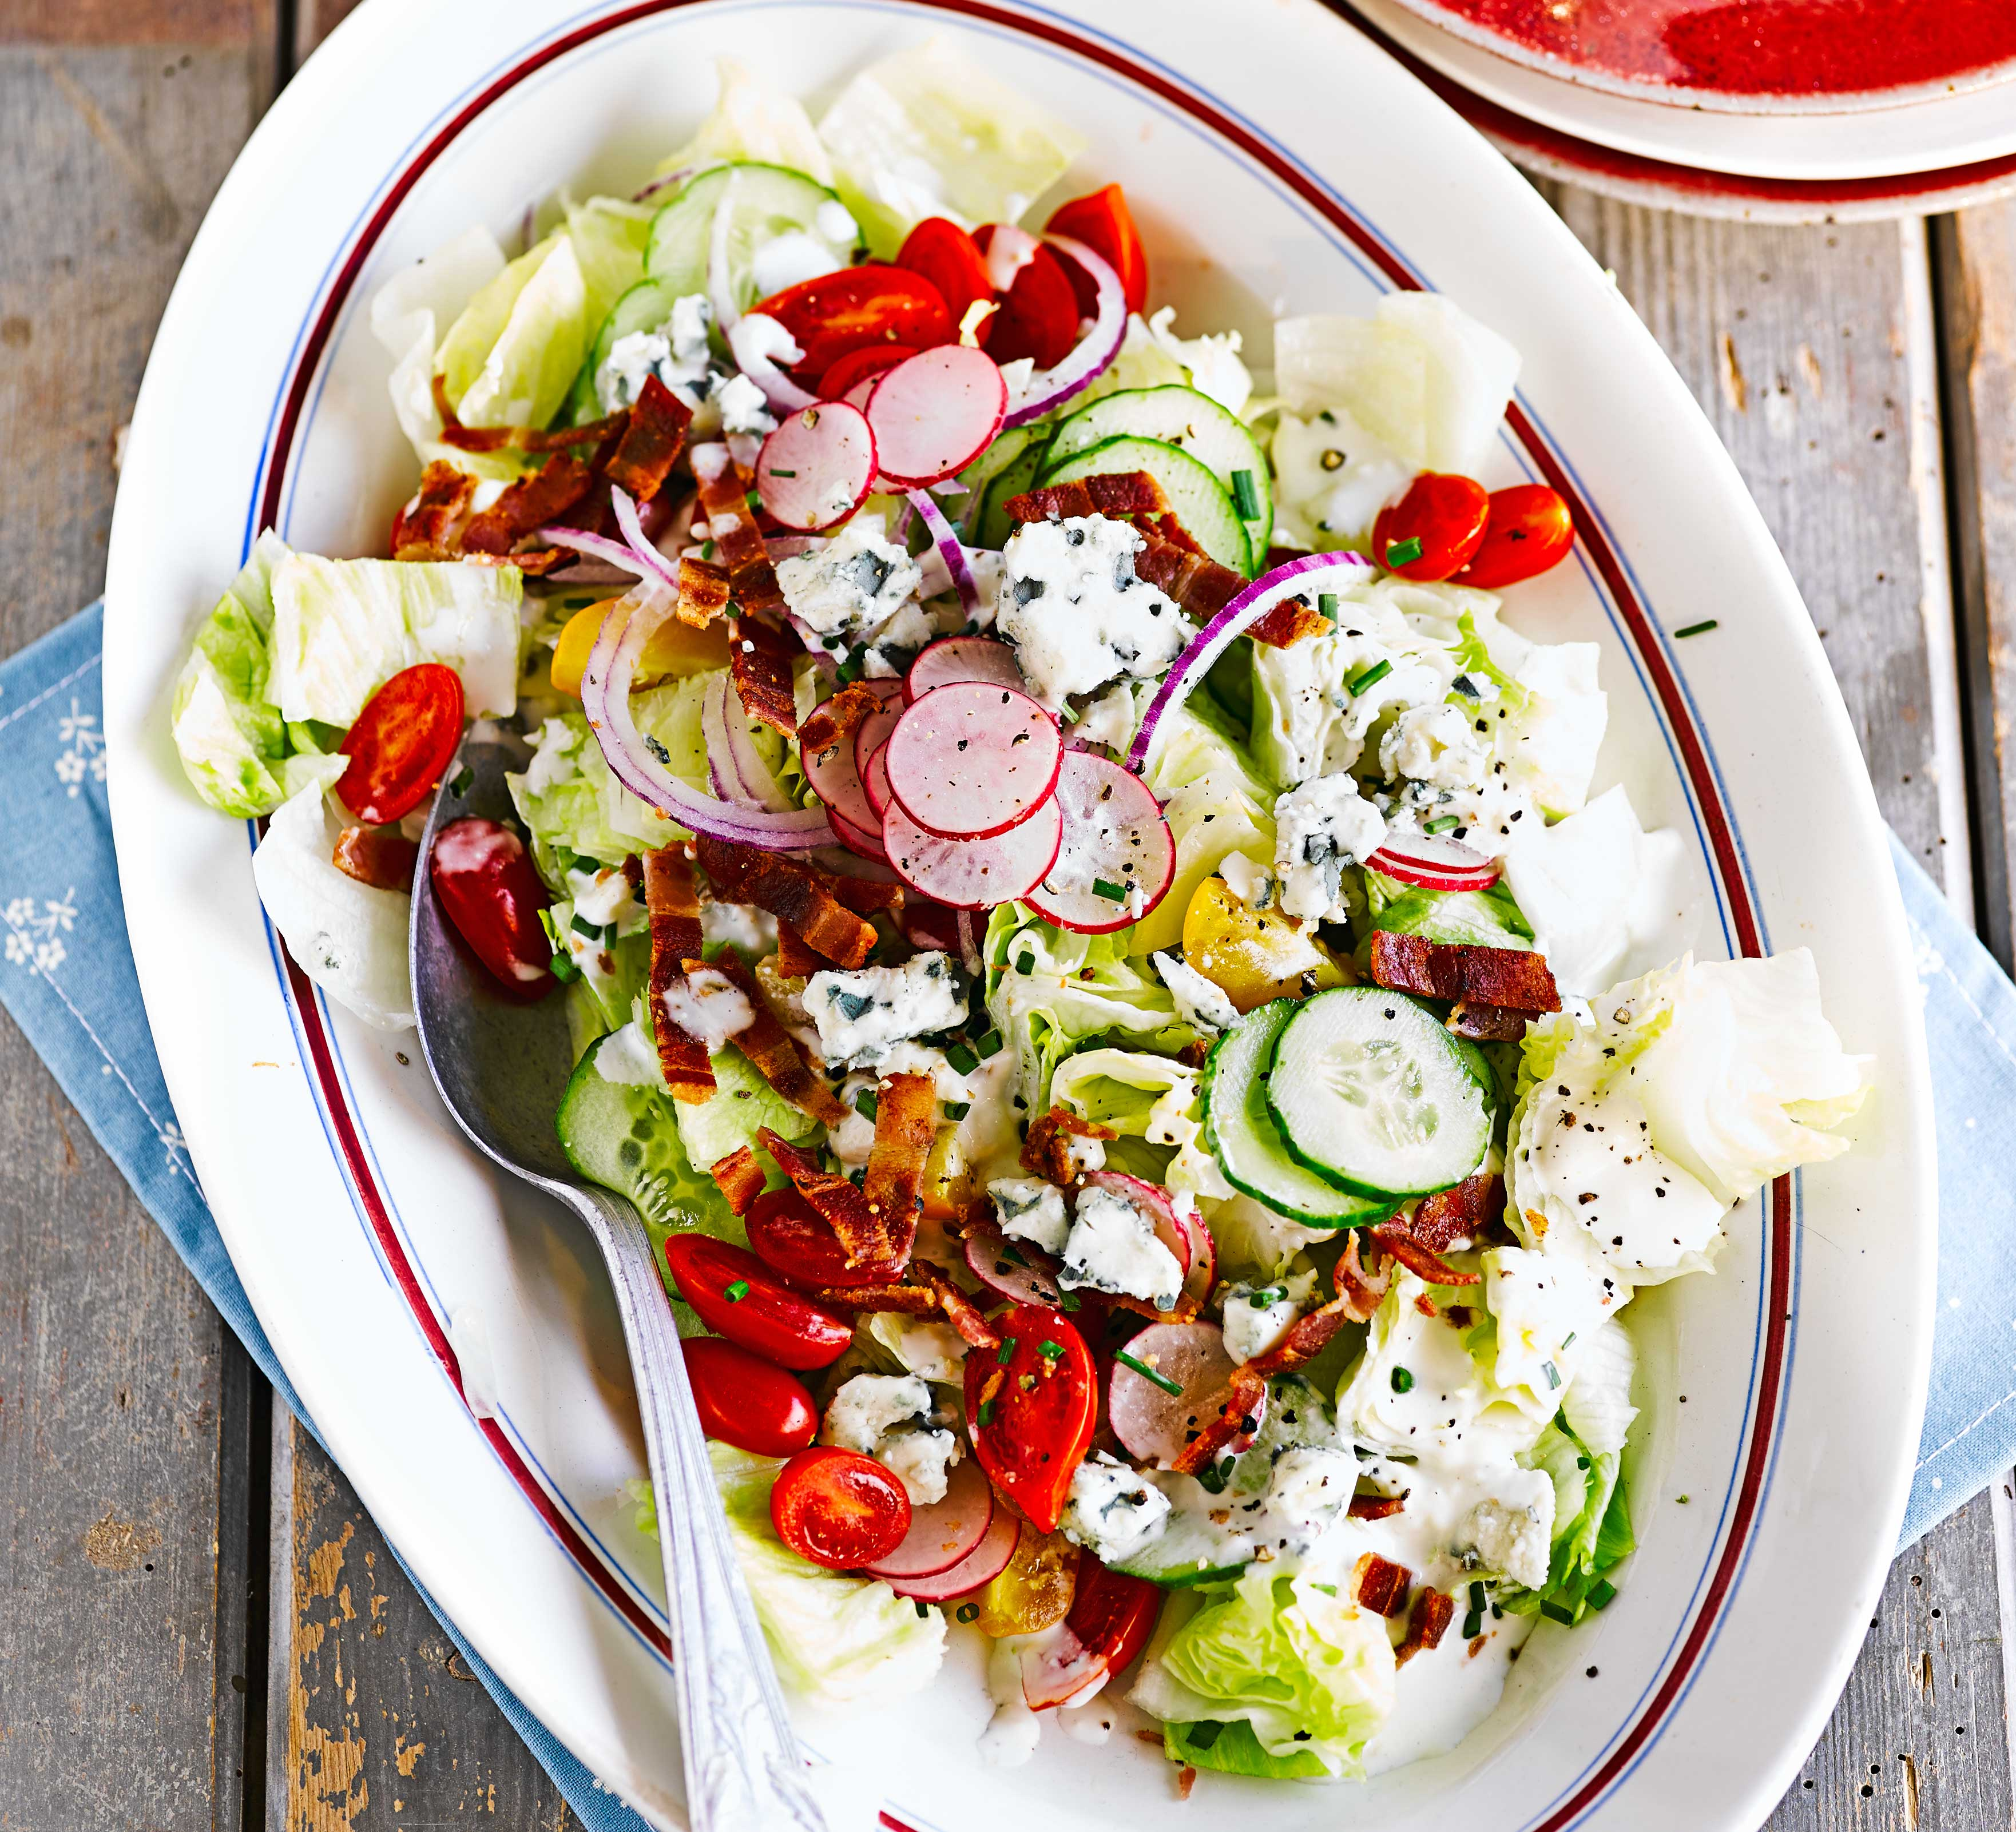 Iceberg salad with Roquefort dressing & bacon